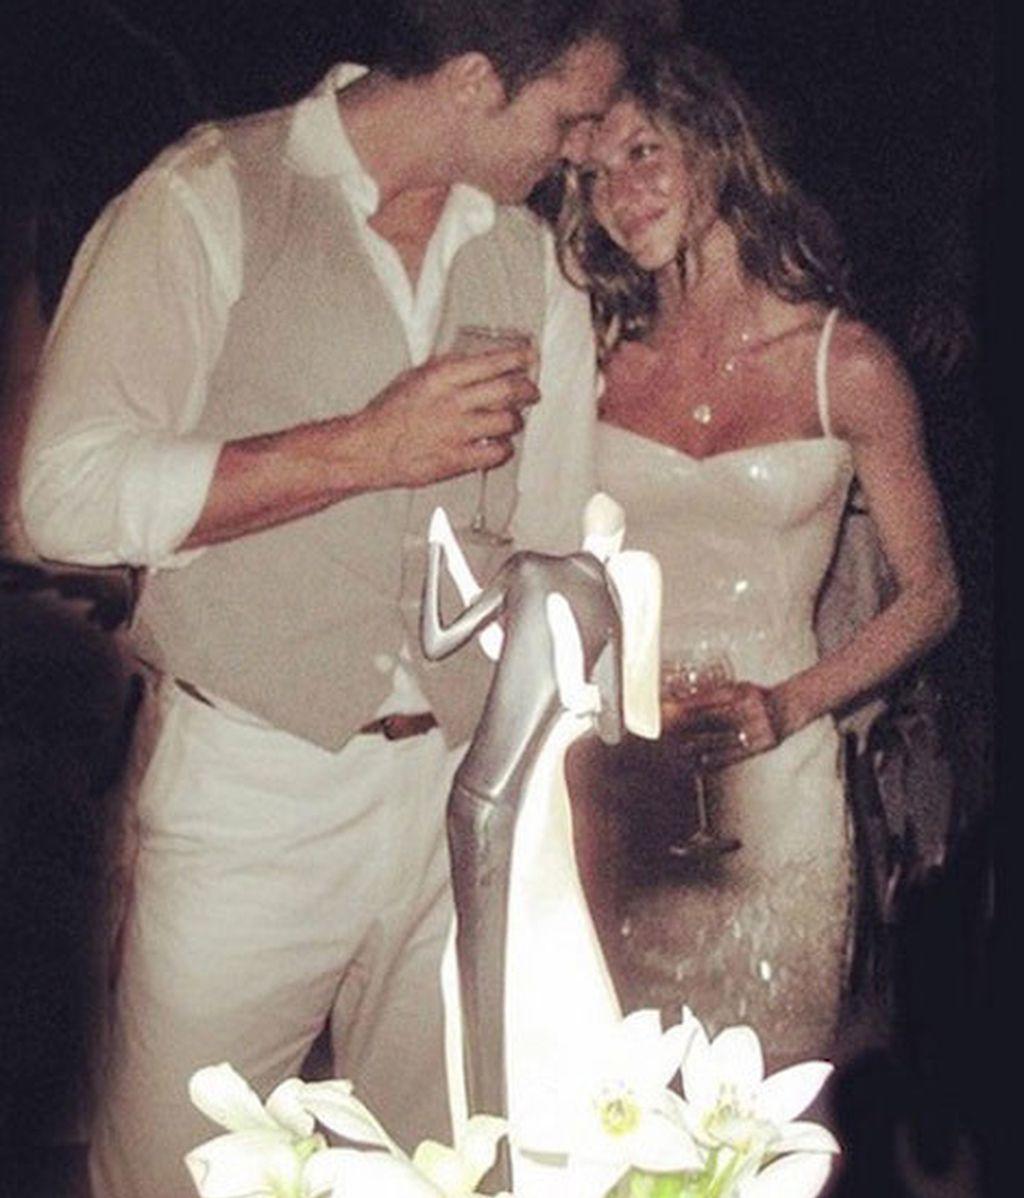 Gisele Bündchen desvela su vestido de novia en Instagram